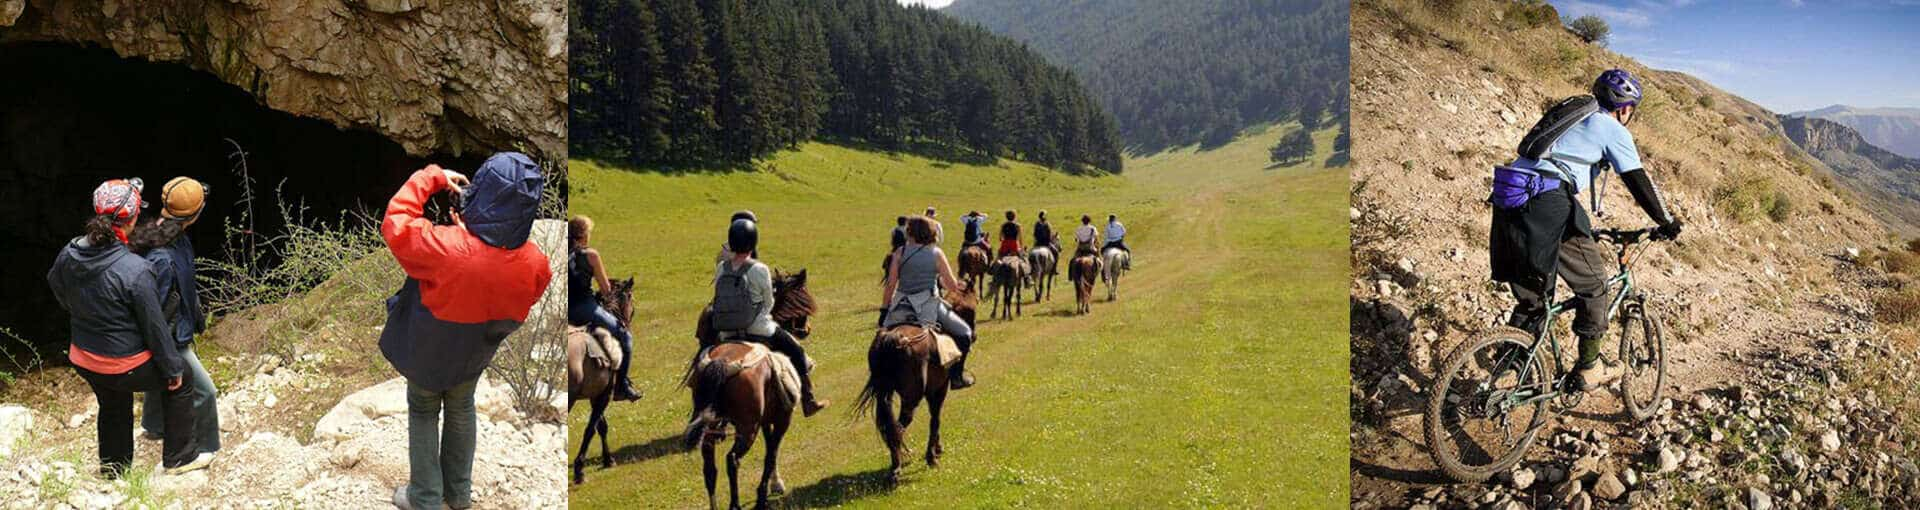 Ecotourism in Armenia